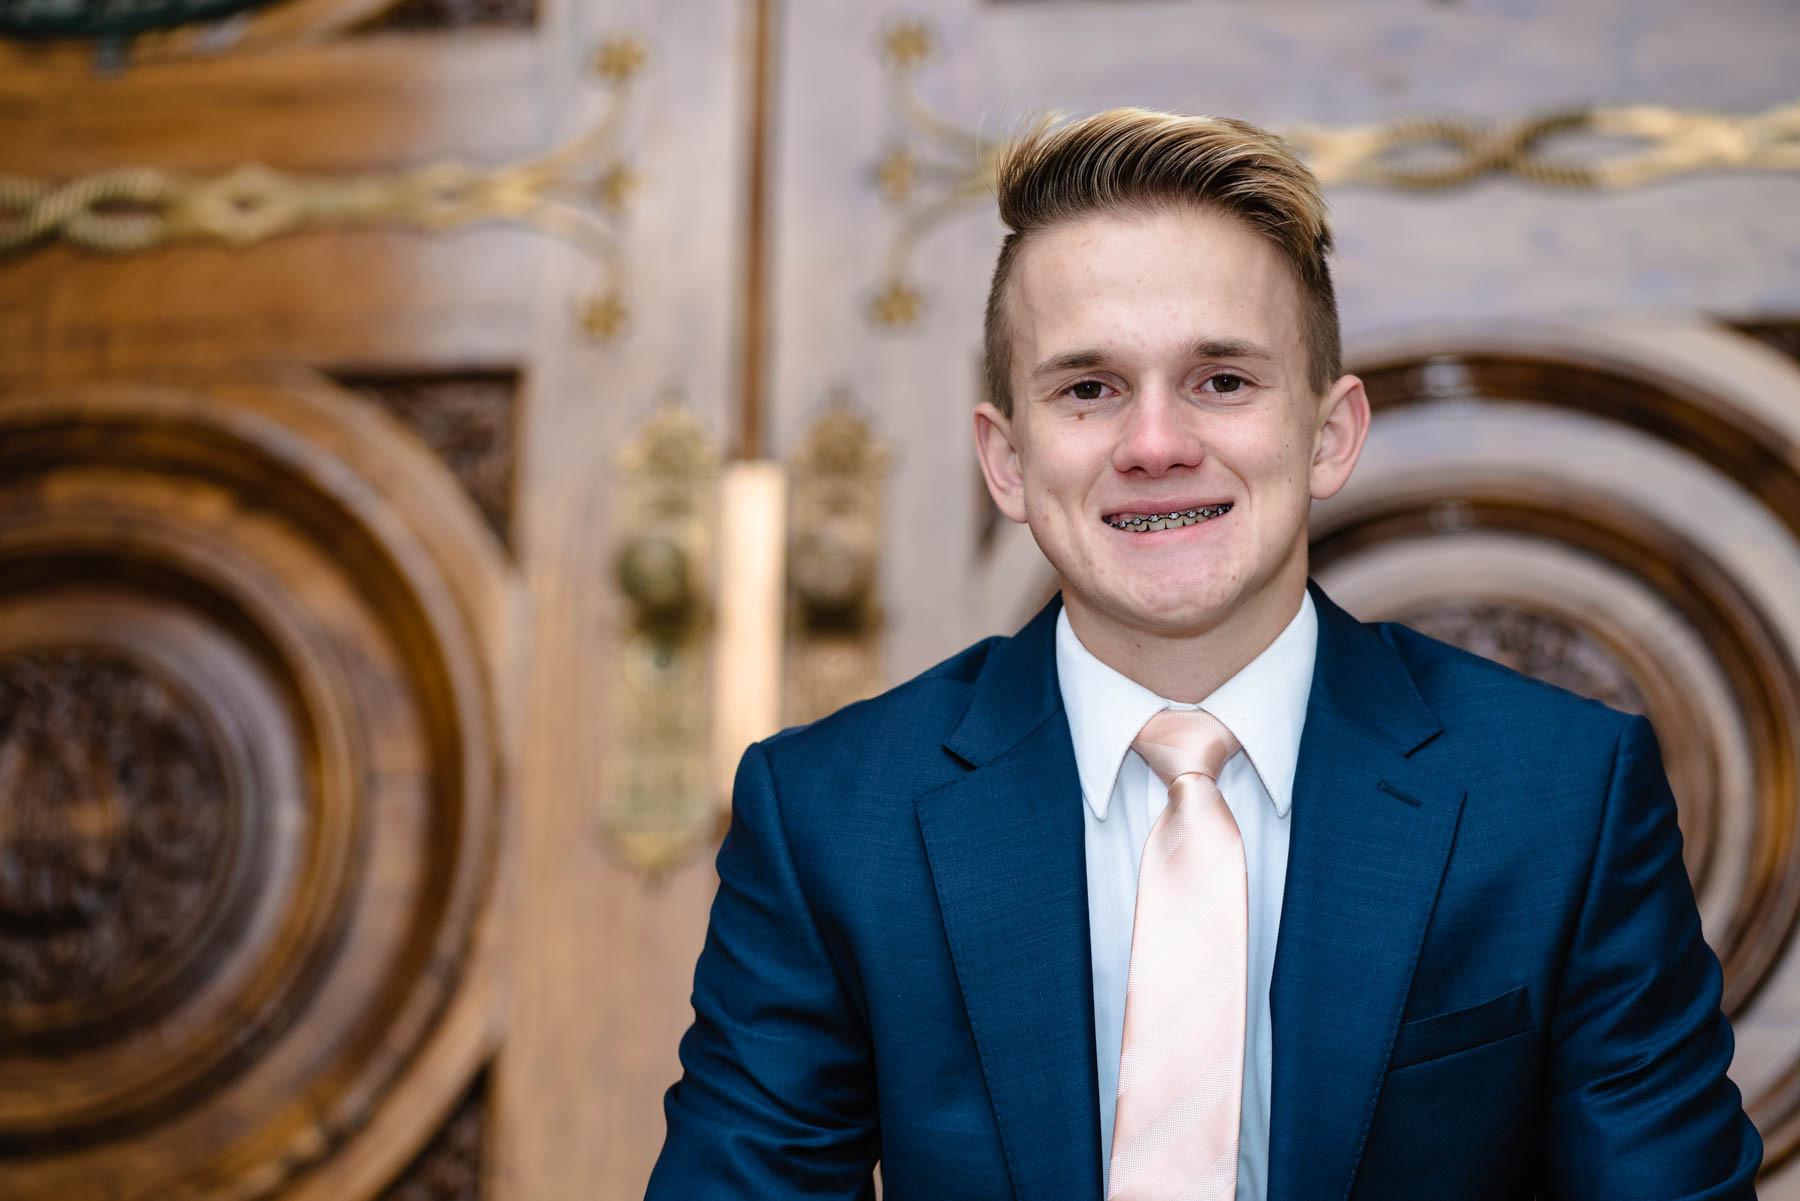 Missionary/Senior Portrait